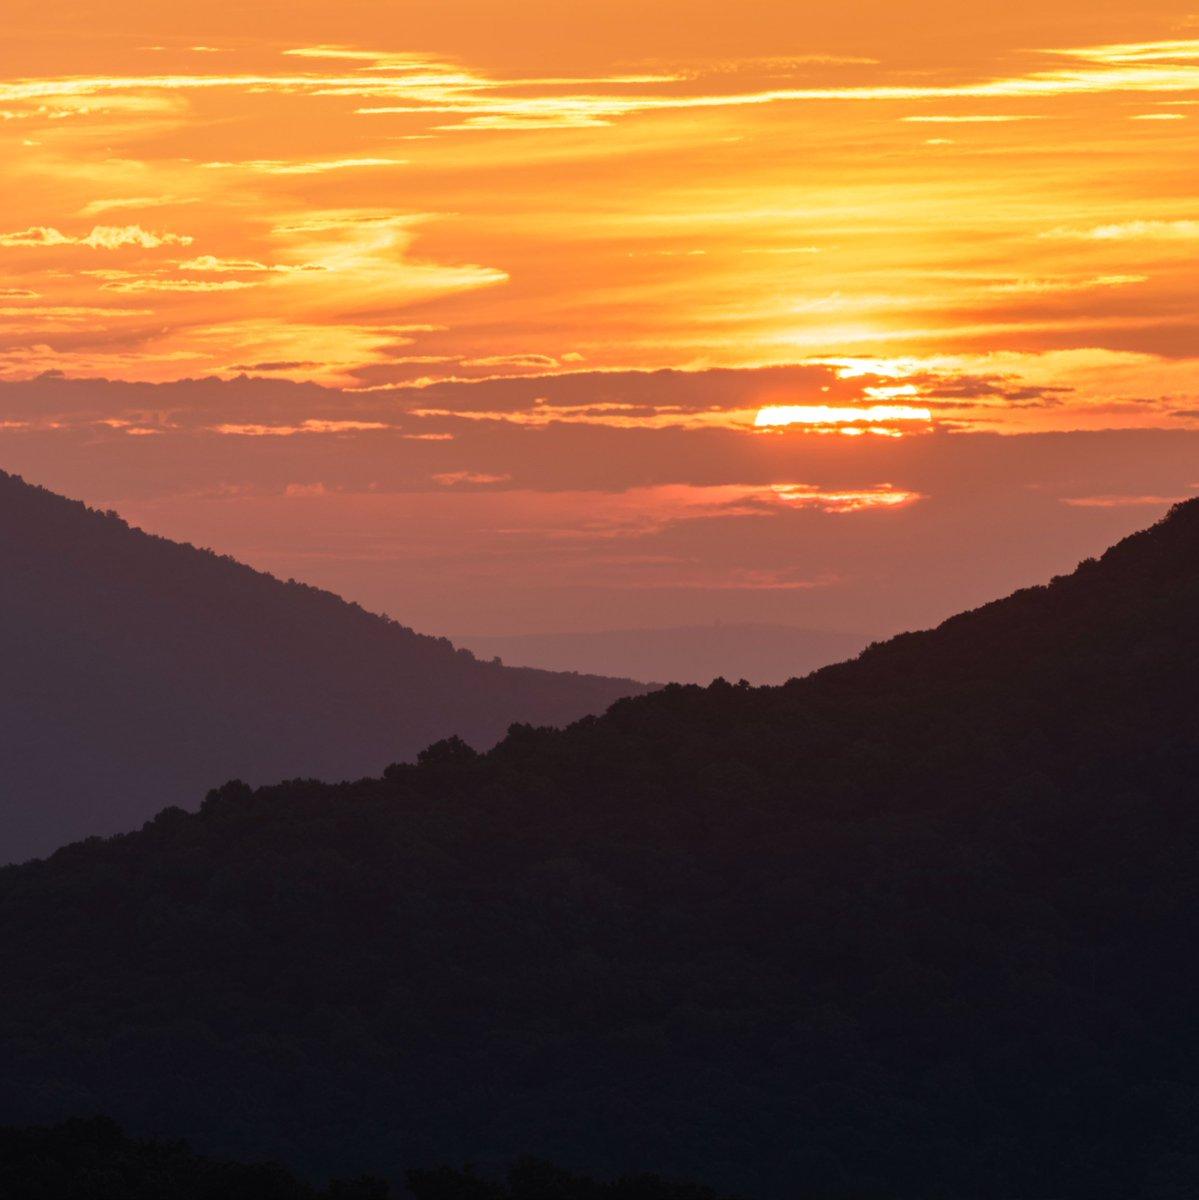 Say hello to the #sunrise @ShenandoahNPS #Virginia